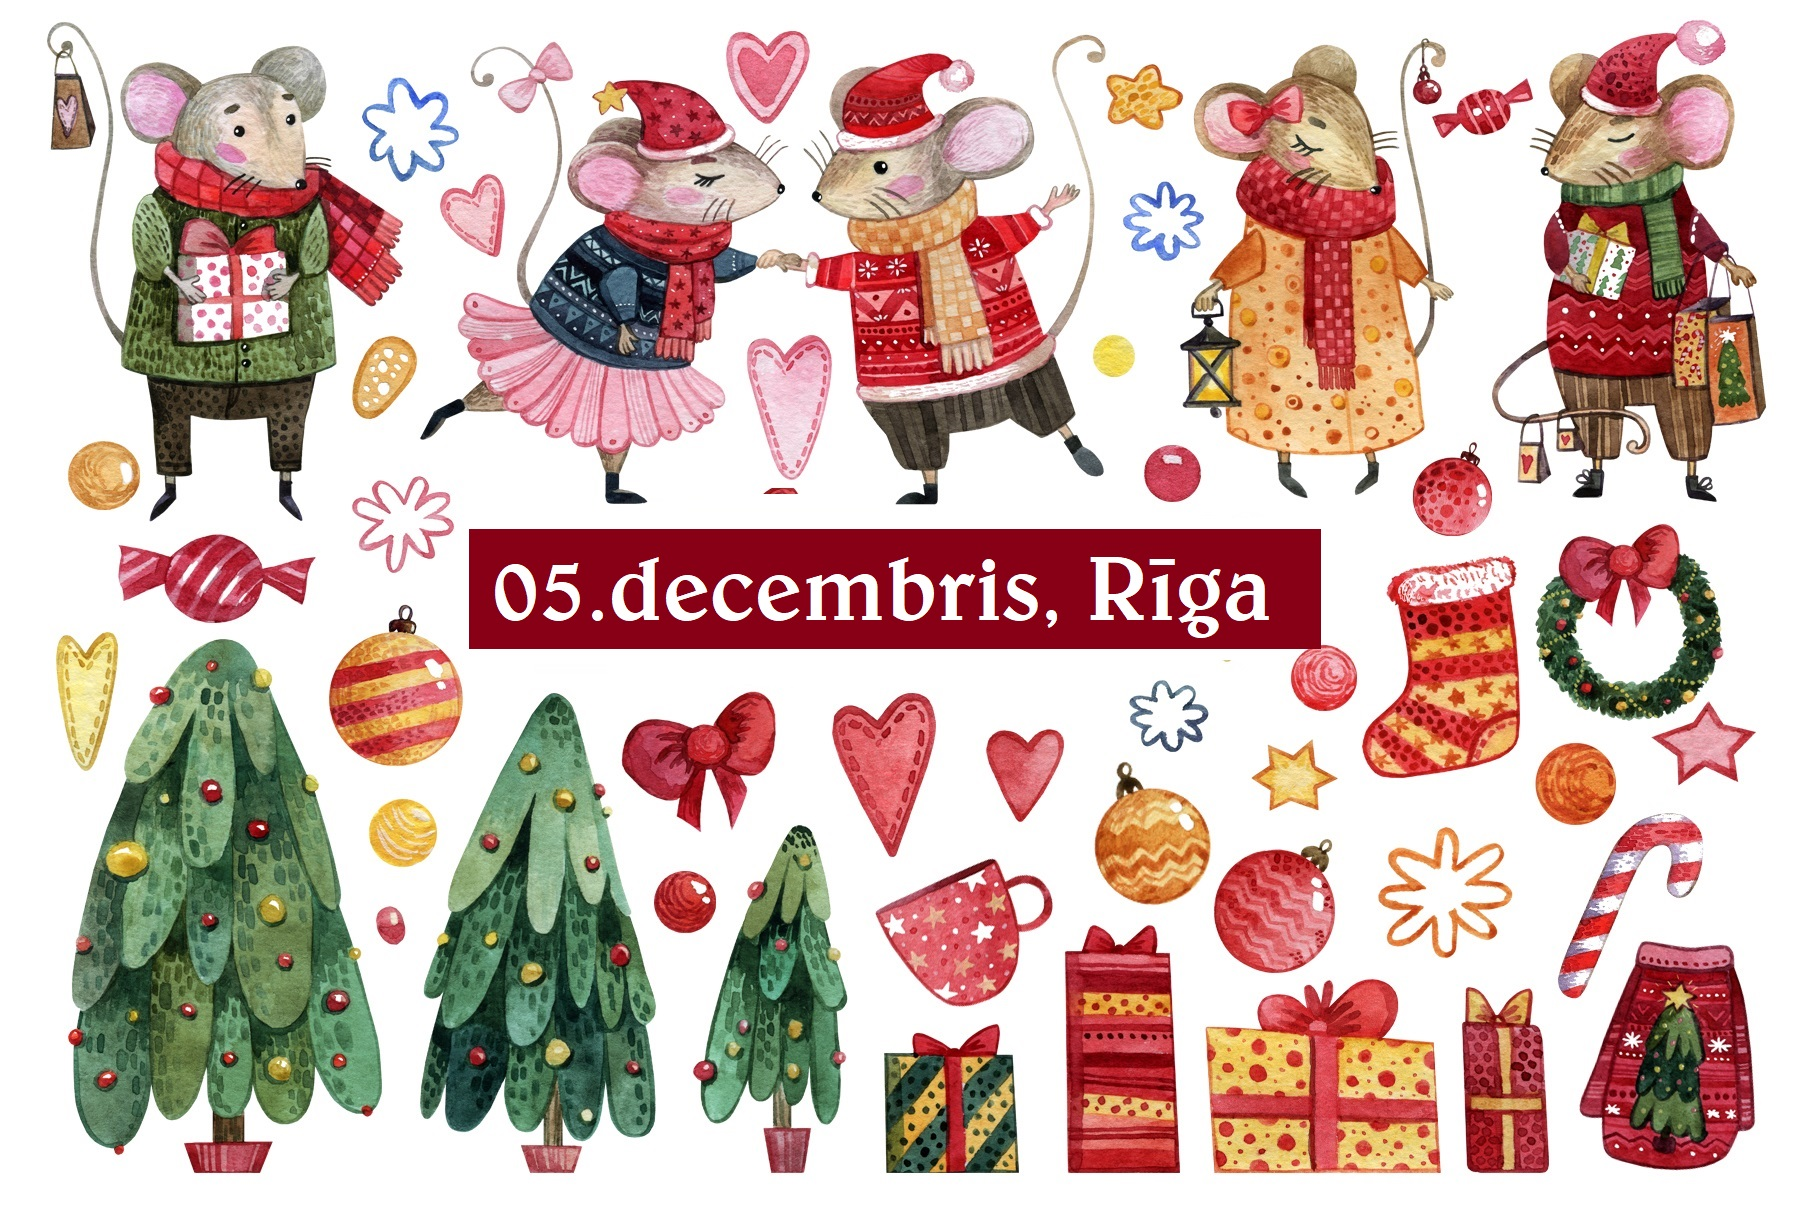 GREAT WINTER fair in Riga